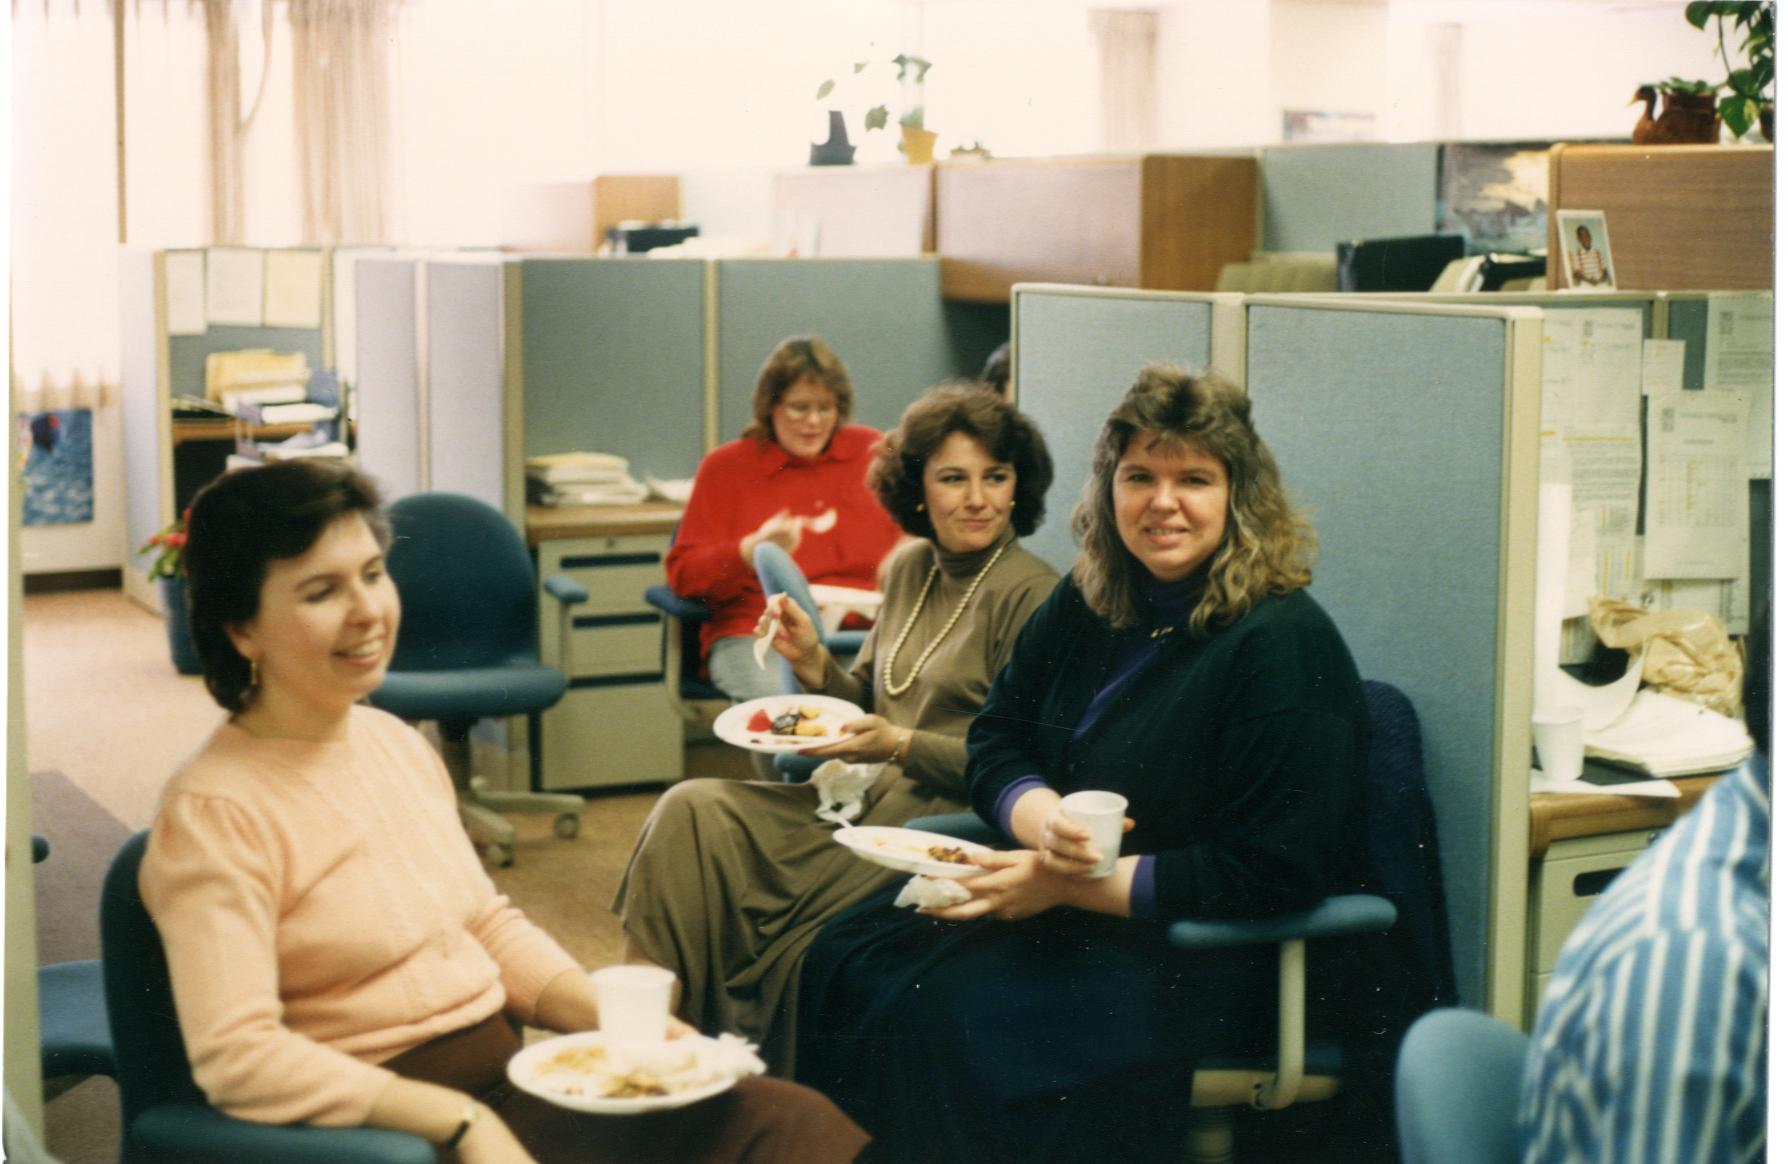 Vintage ATPCO - Ann Lowden, red shirt? Mary Ann Smith?, Sue Lyles